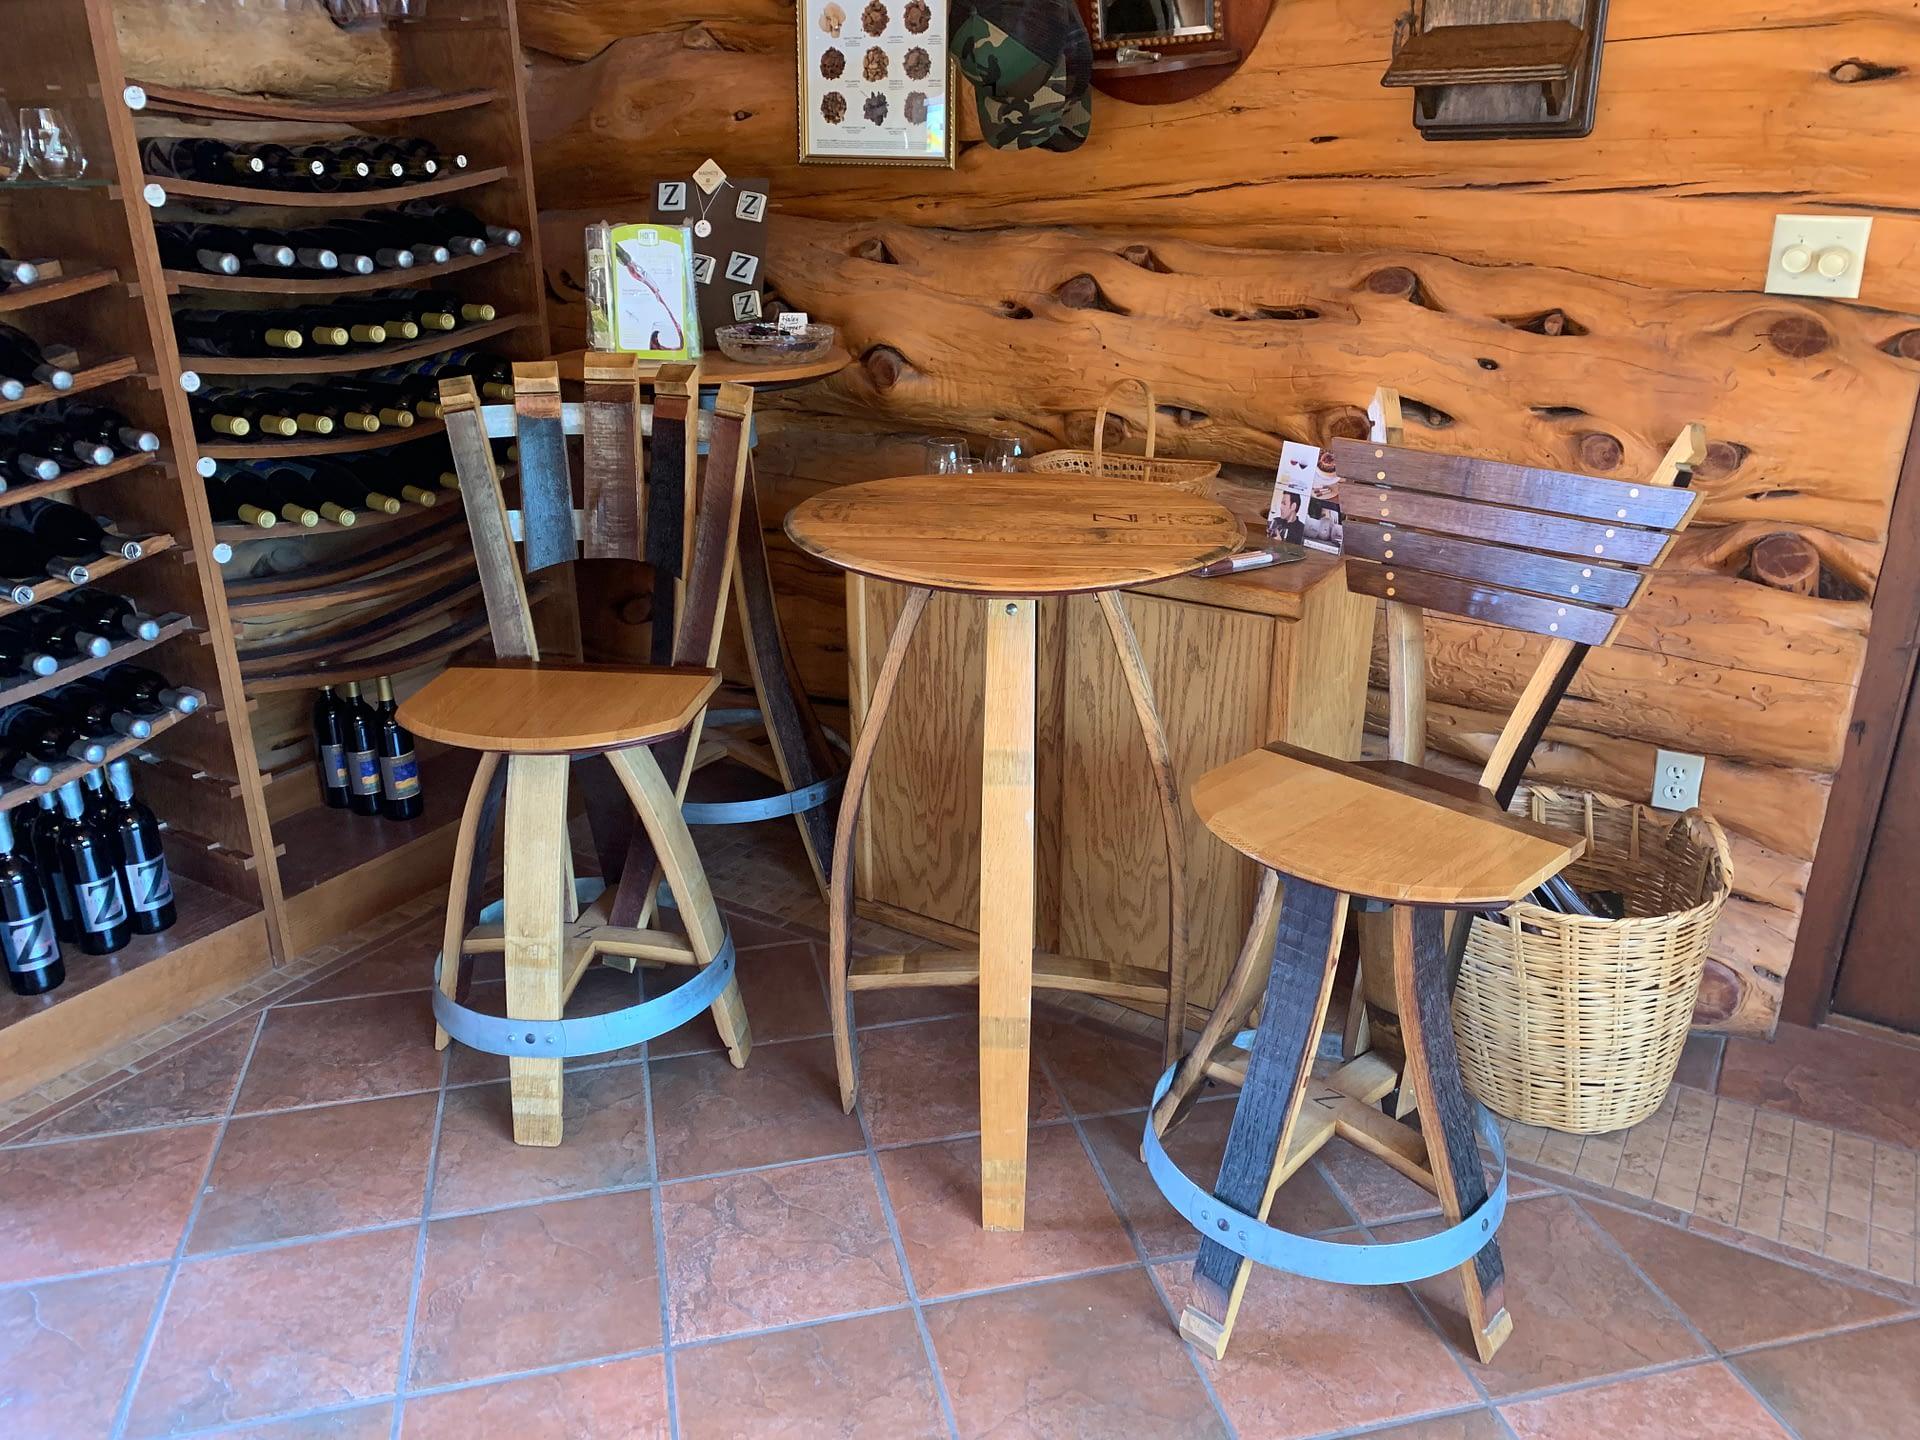 Rustic tasting room of Zerba Wine Cellars in Walla Walla Valley Milton-Freewater, Oregon